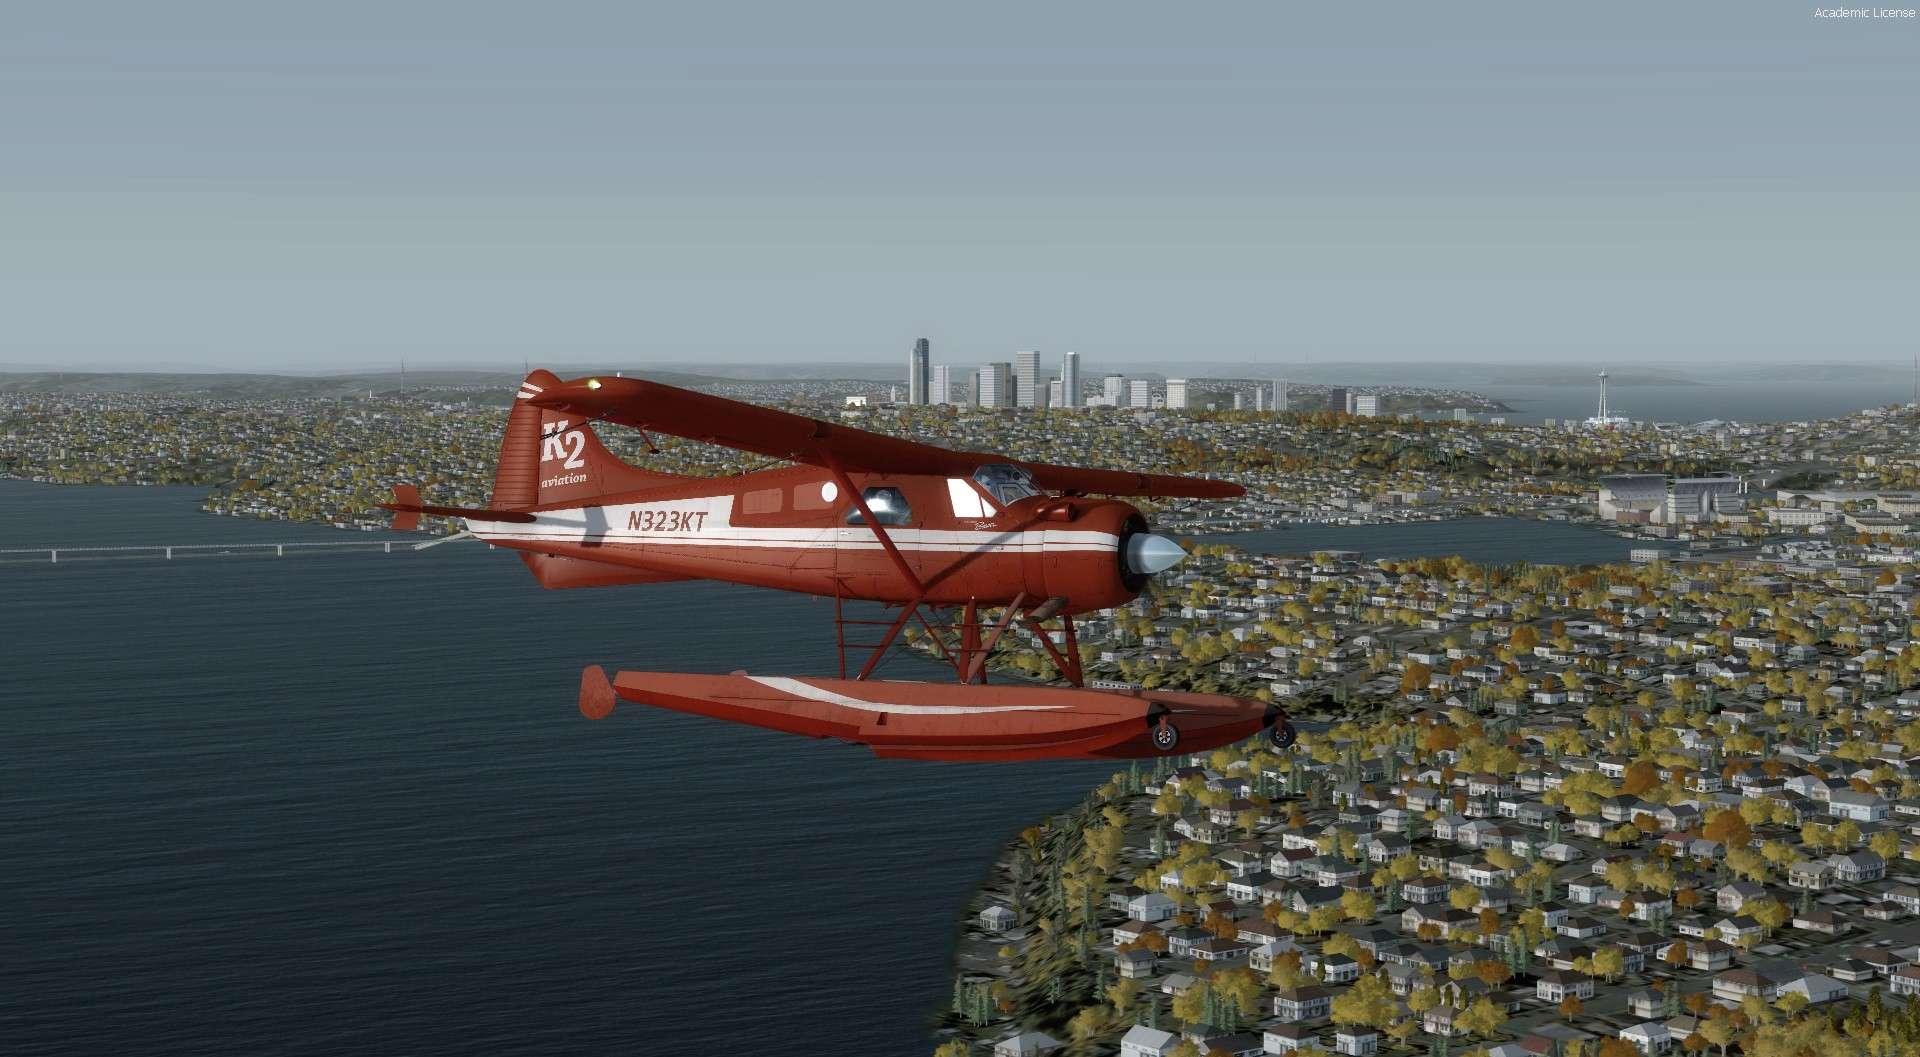 Compte rendu du vol Kenmore Air Harbor (W55) à Kenmore Air Harbor (W55) 2017-115